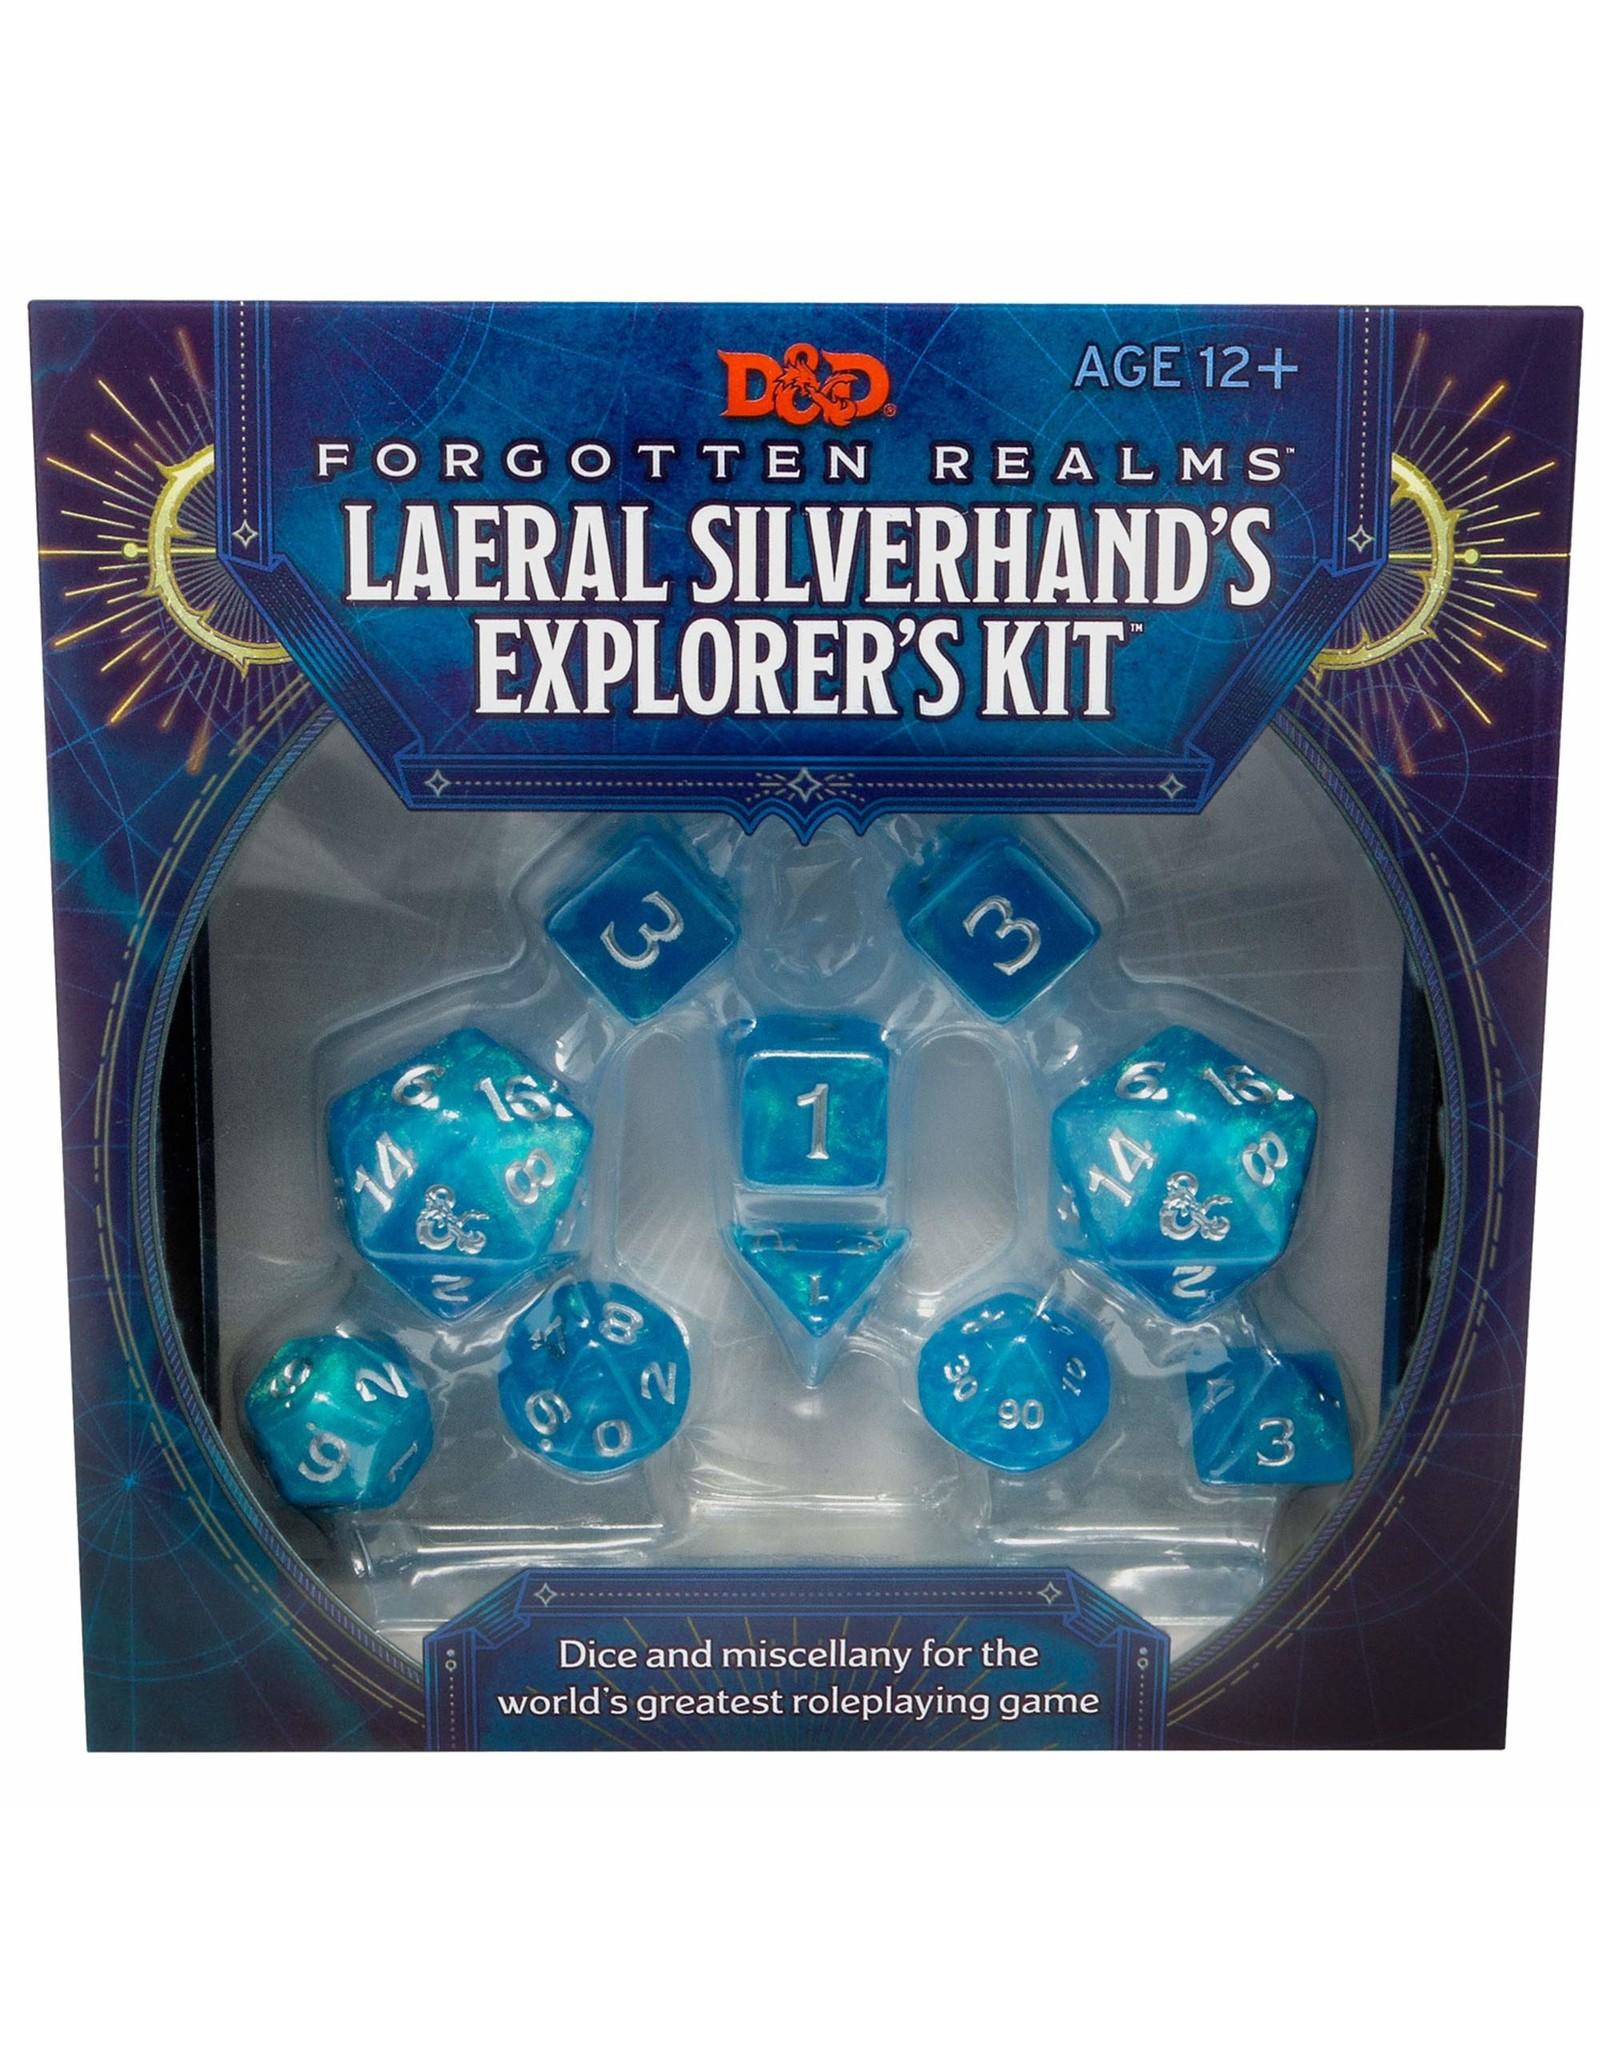 Dungeons & Dragons D&D 5E: Forgotten Realms Laeral Silverhands Explorers Kit